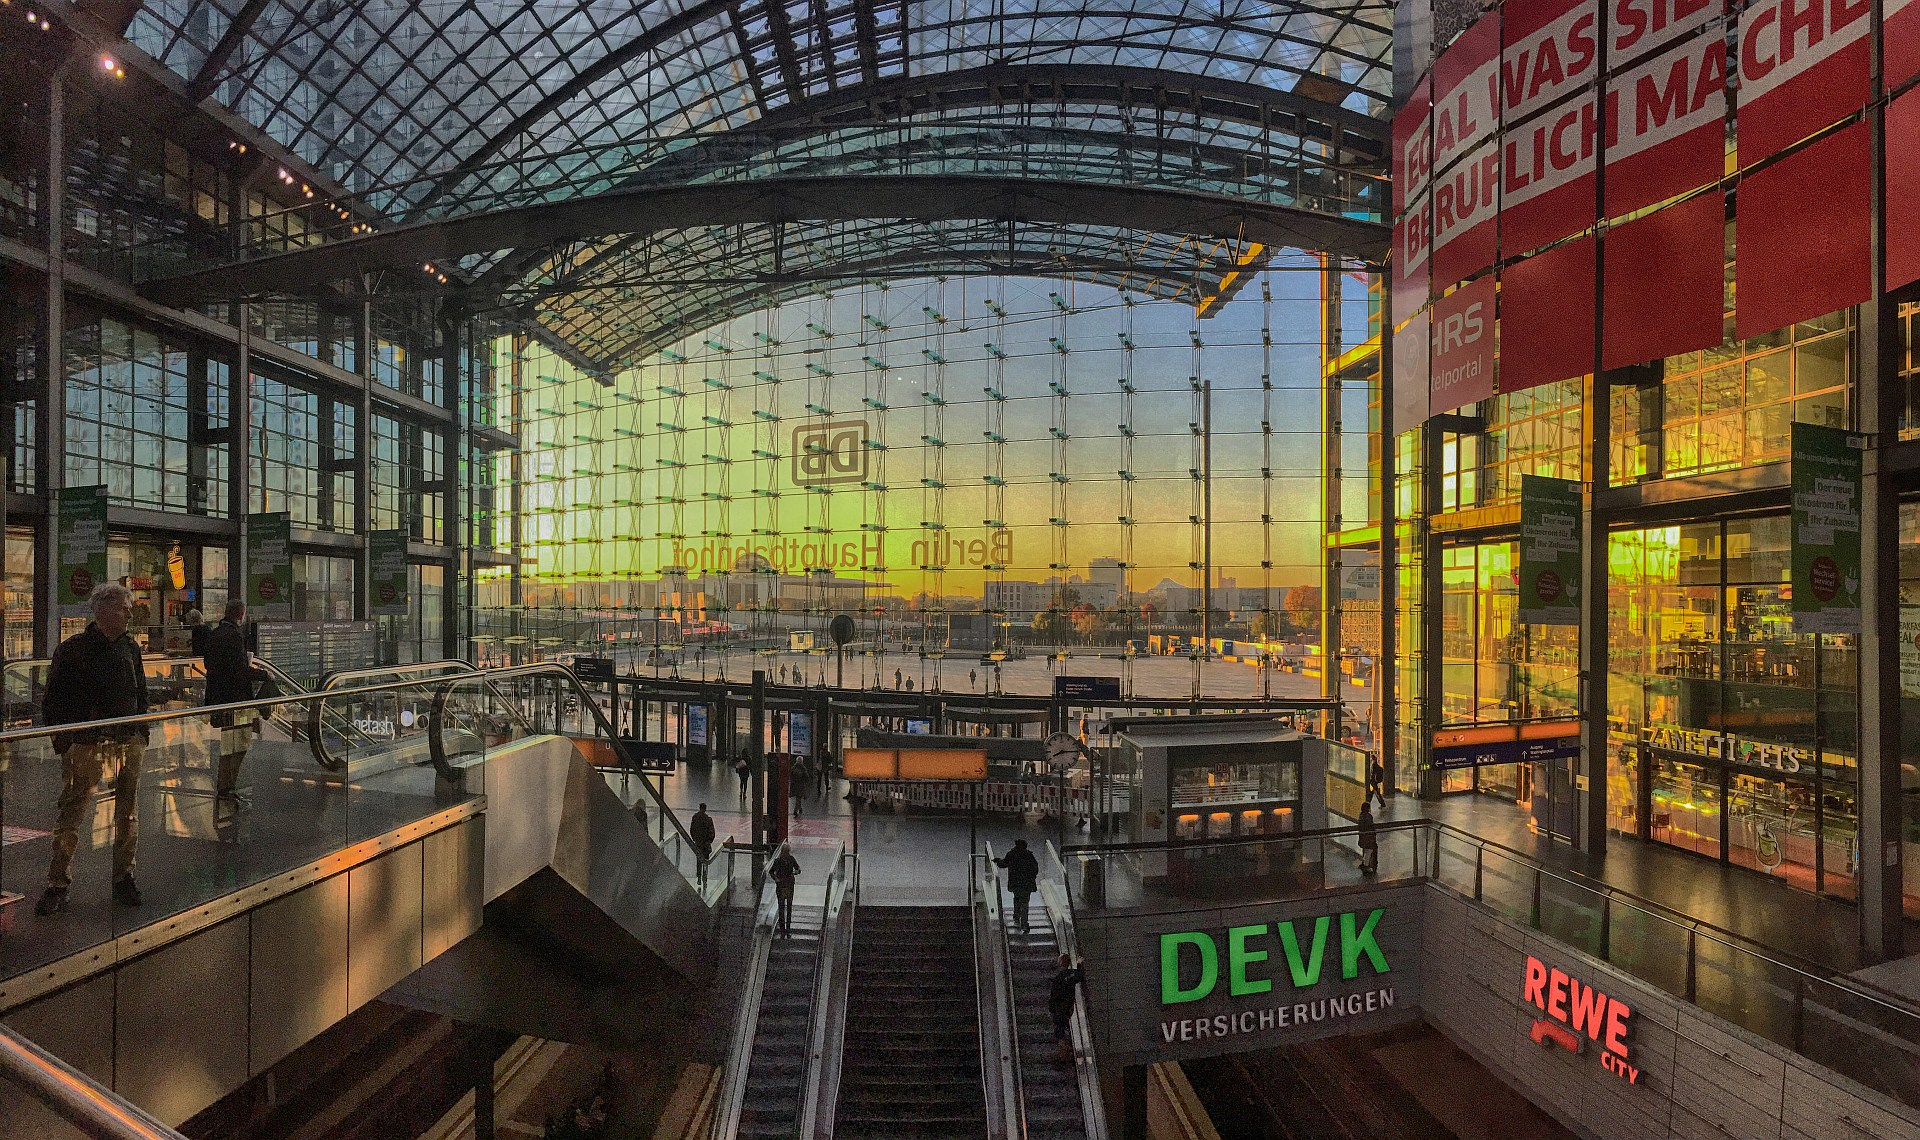 Main station, Berlin